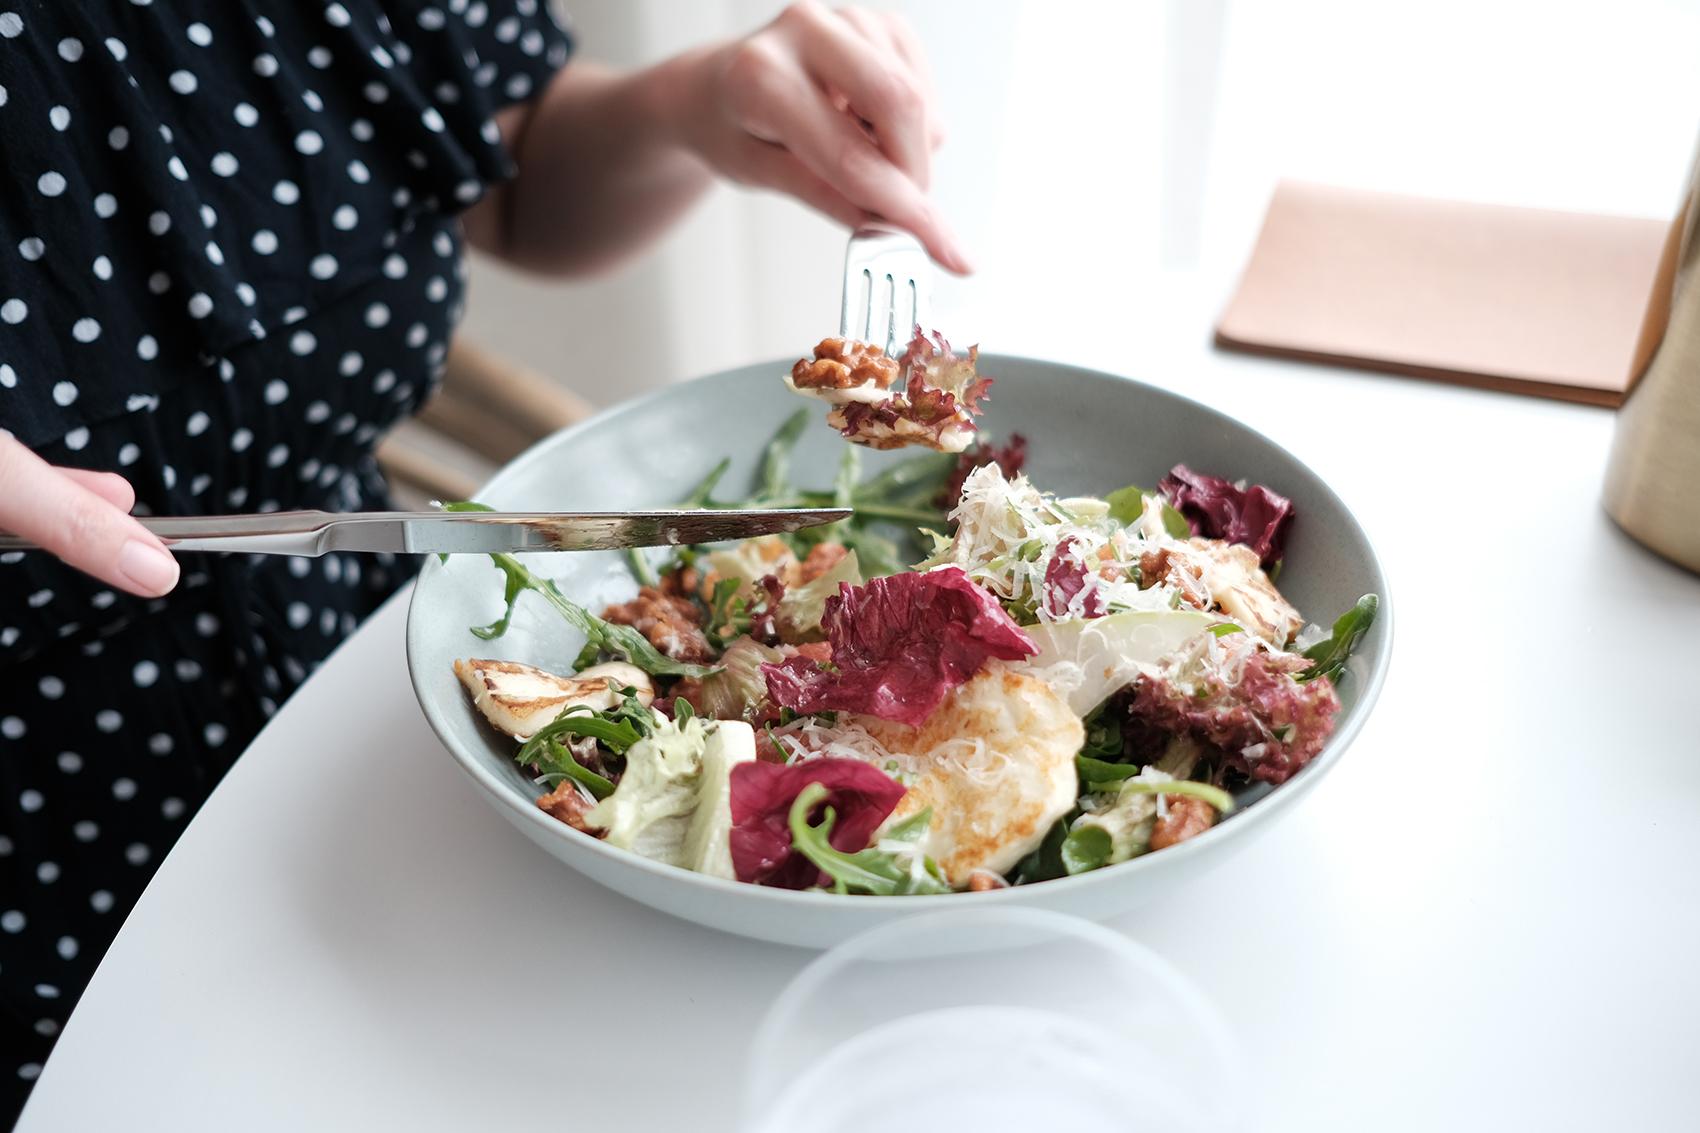 banisters_port_stephens_lunch_salad_ZIDS1253.jpg